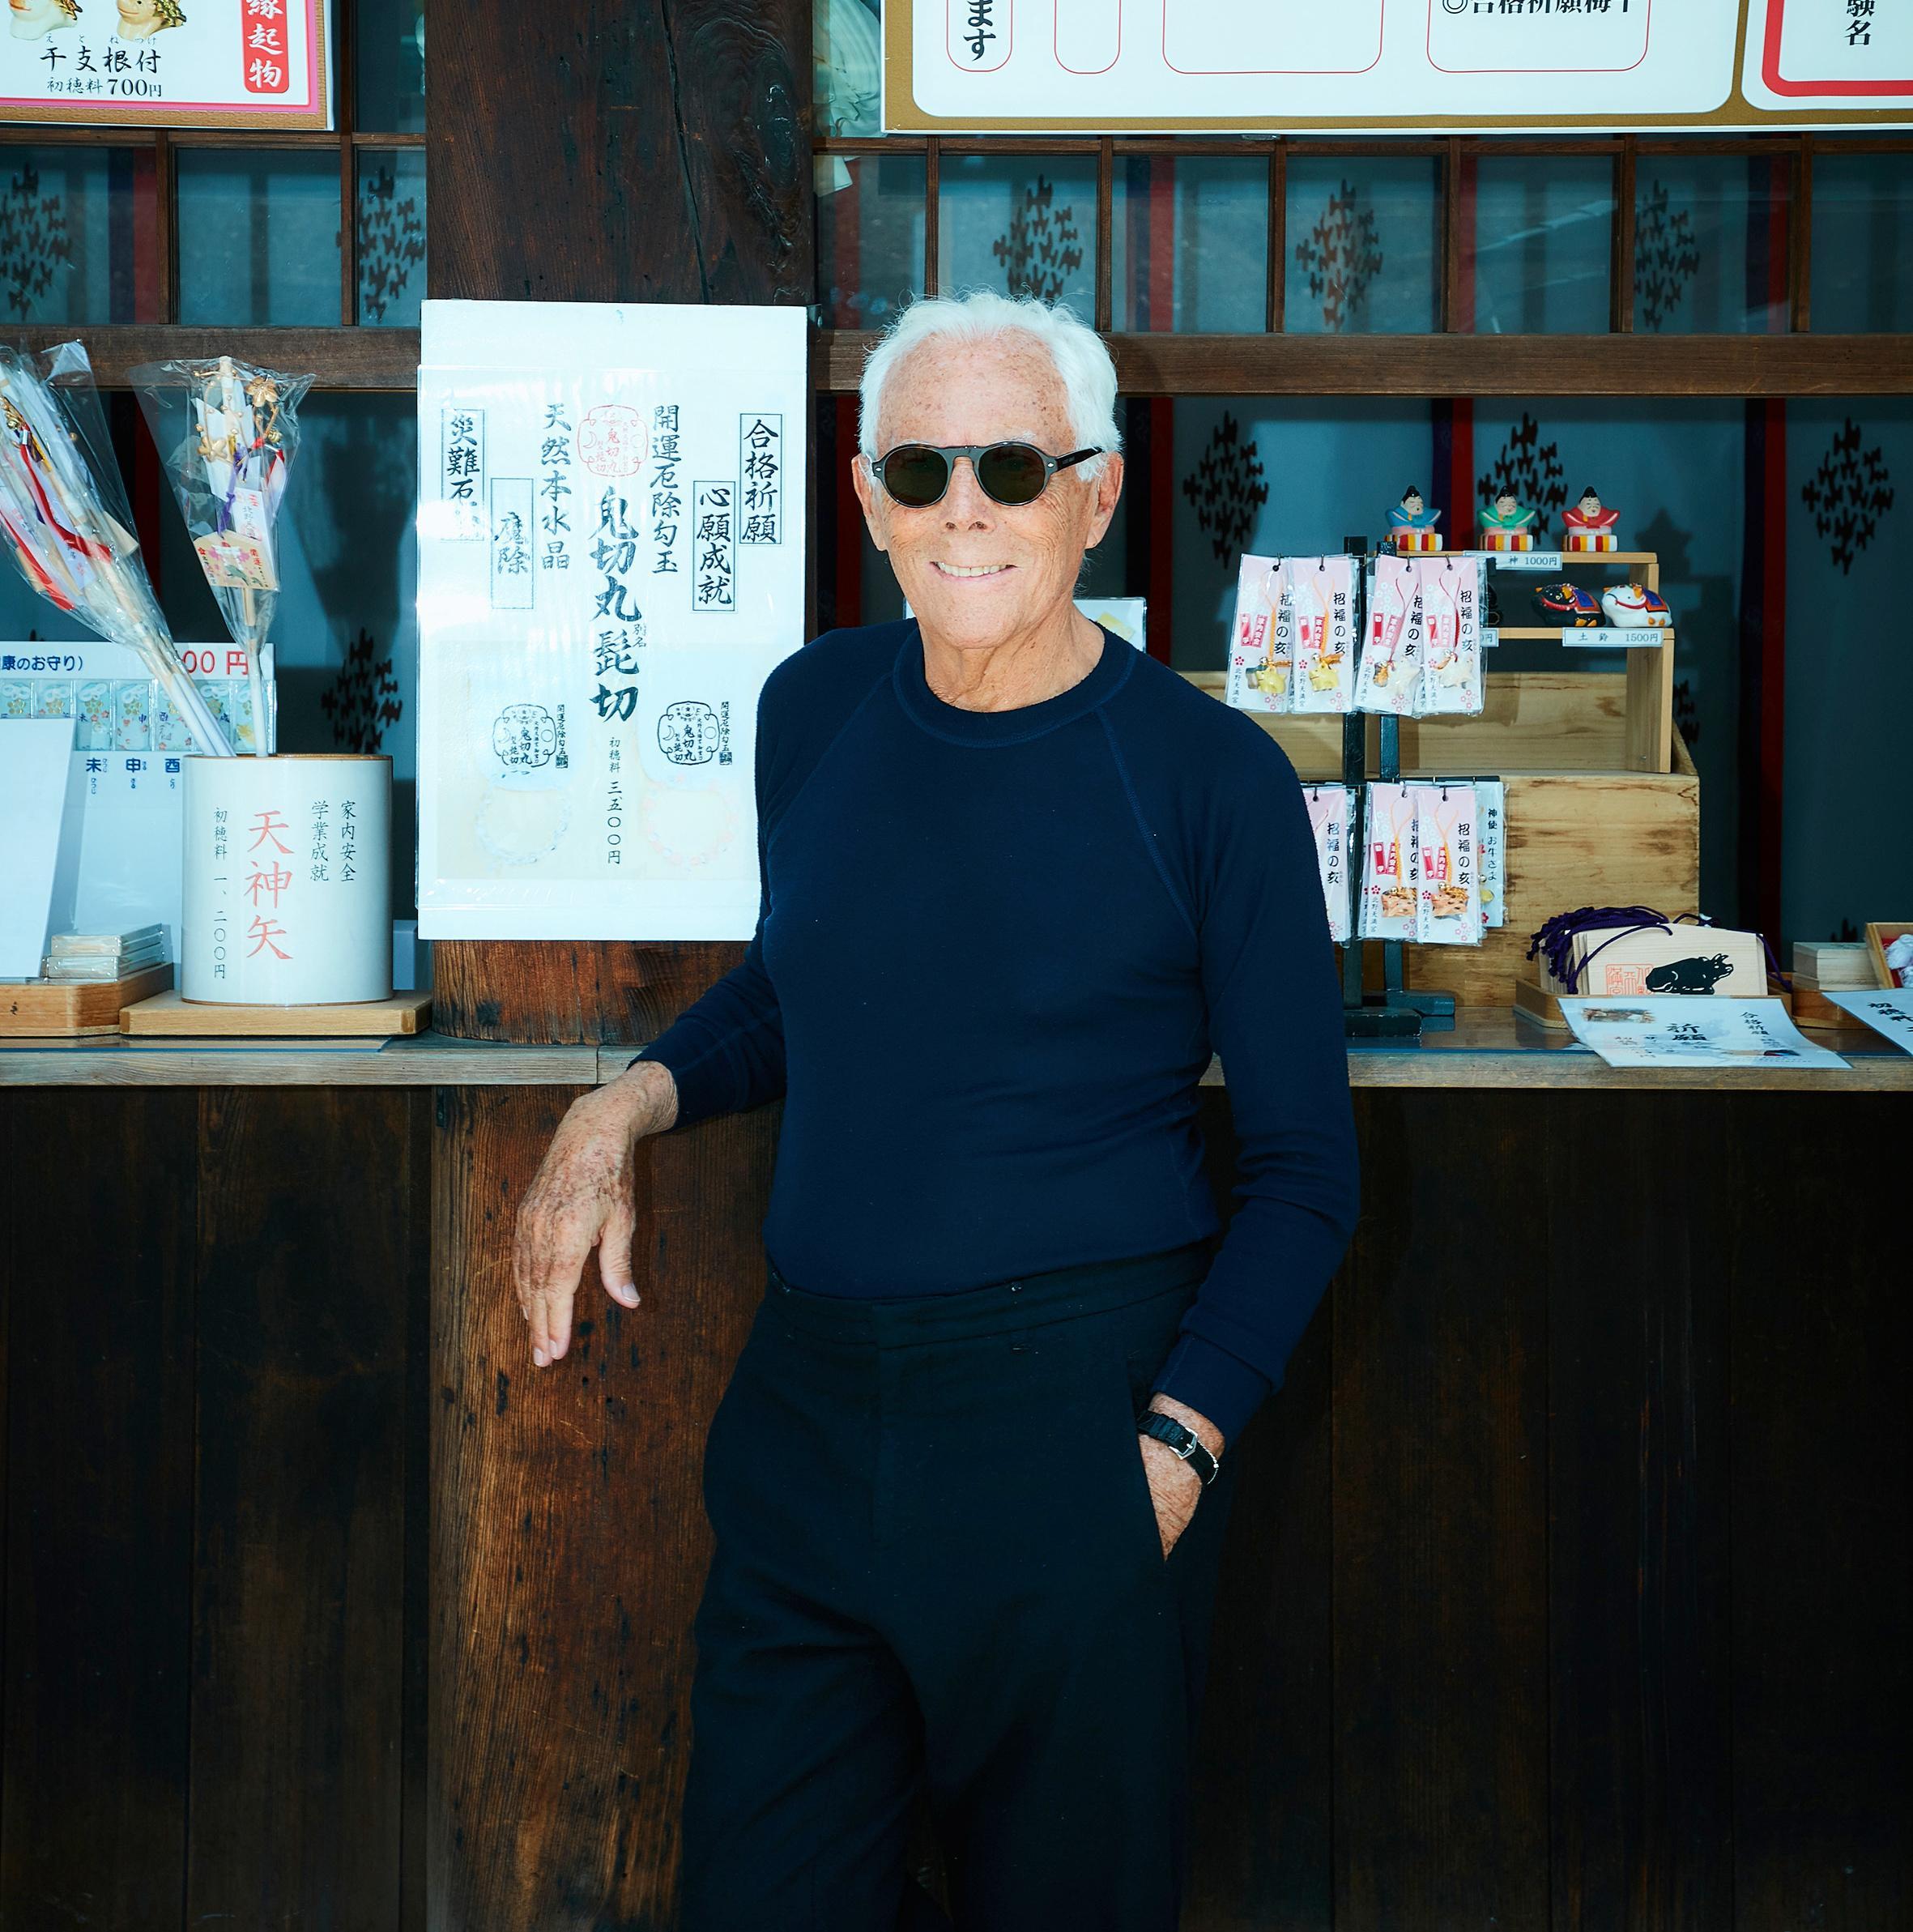 Giorgio Armani: 'Japan always keeps its soul'